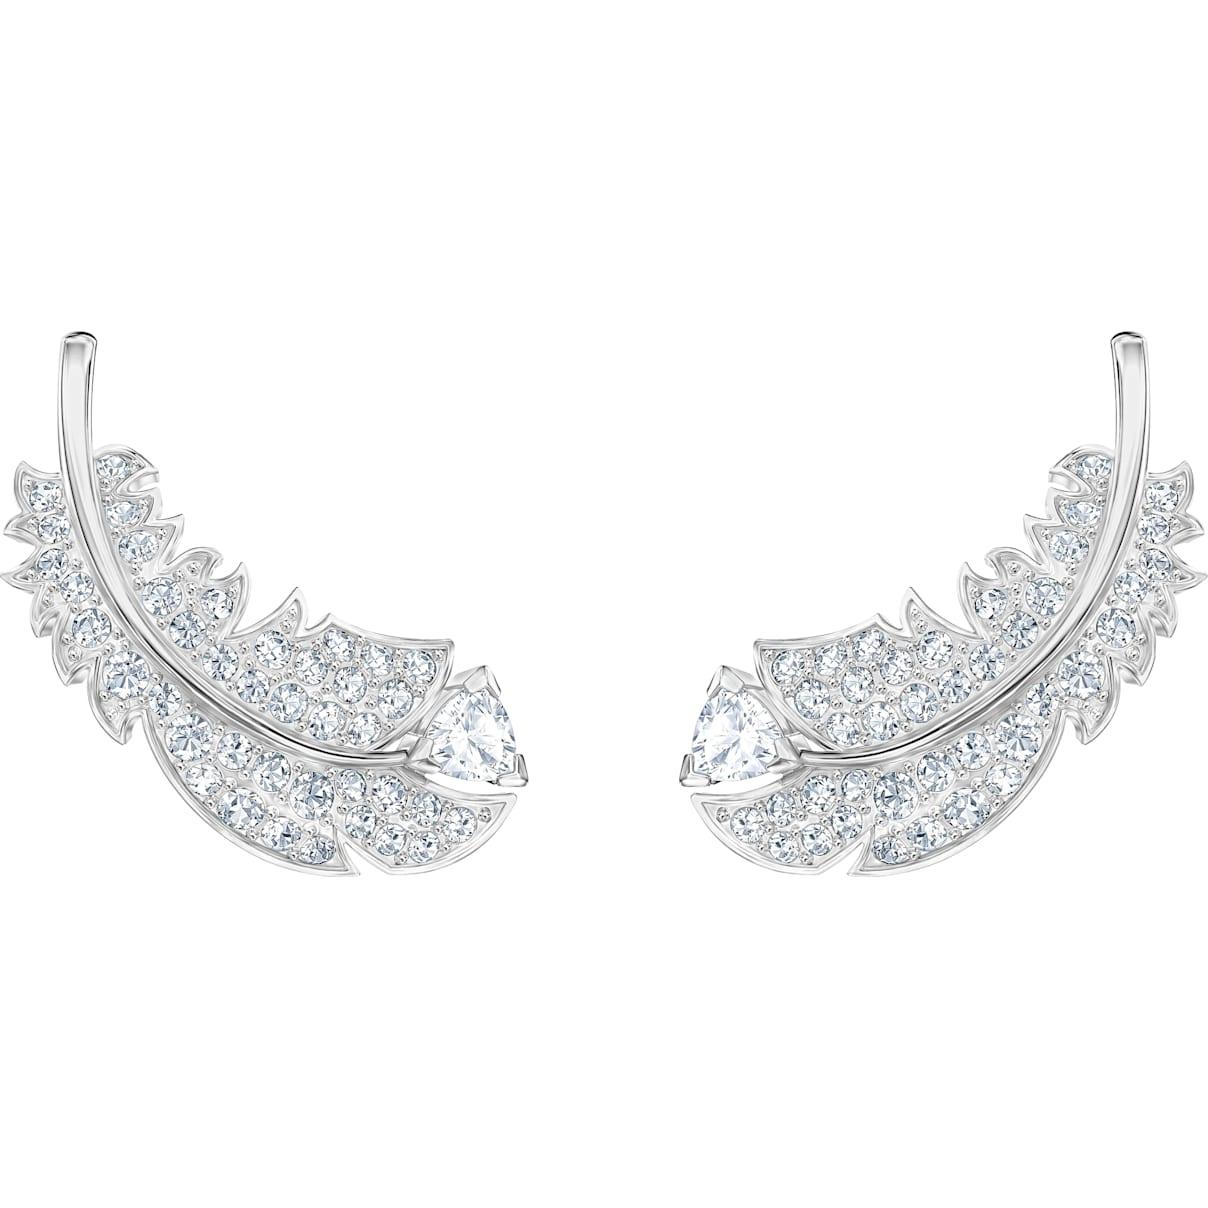 Swarovski Nice Stud Pierced Earrings, White, Rhodium plated